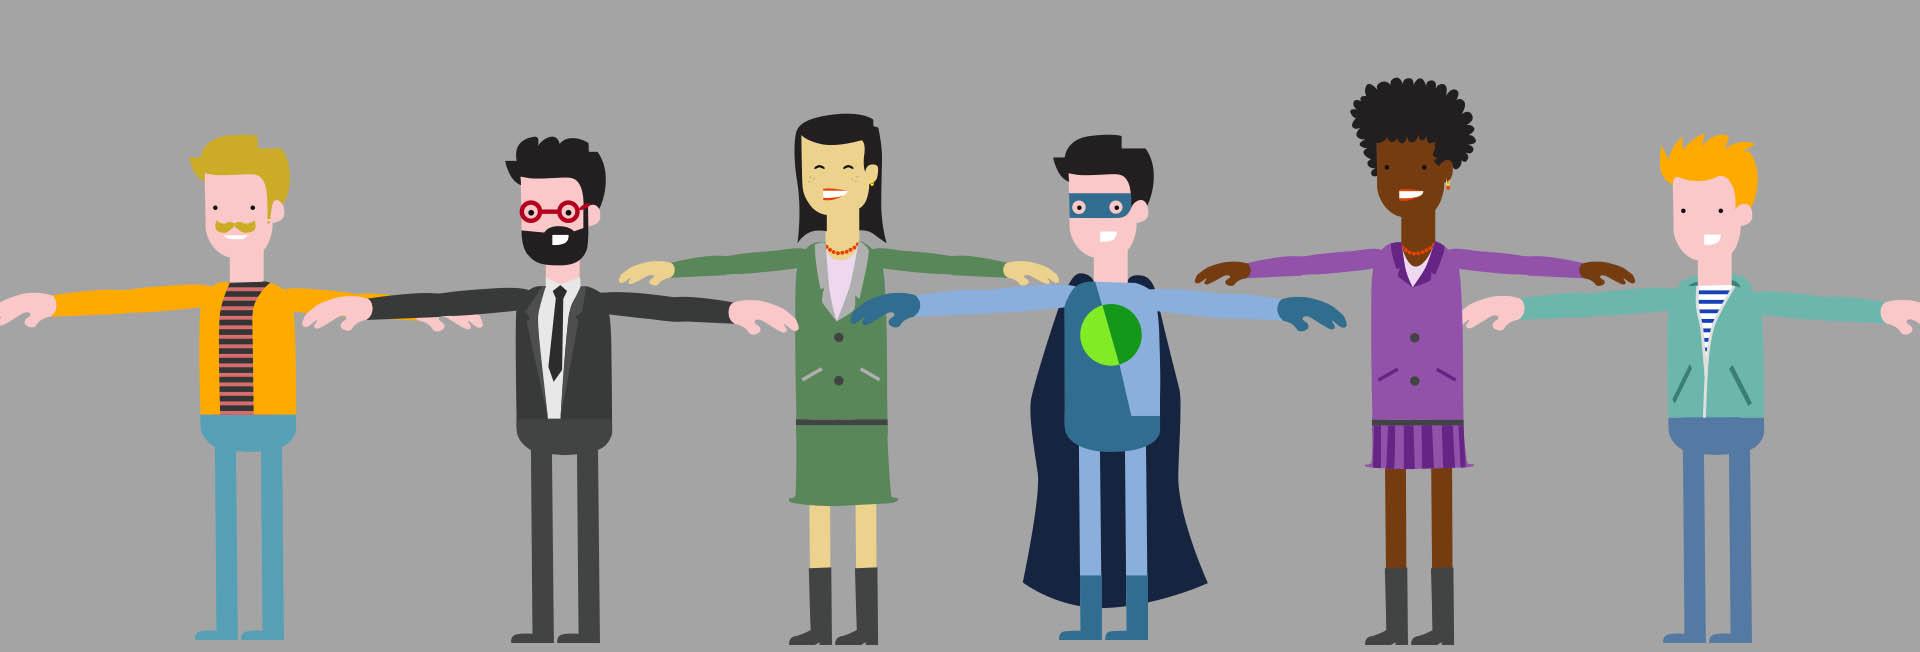 Characters concept flat design